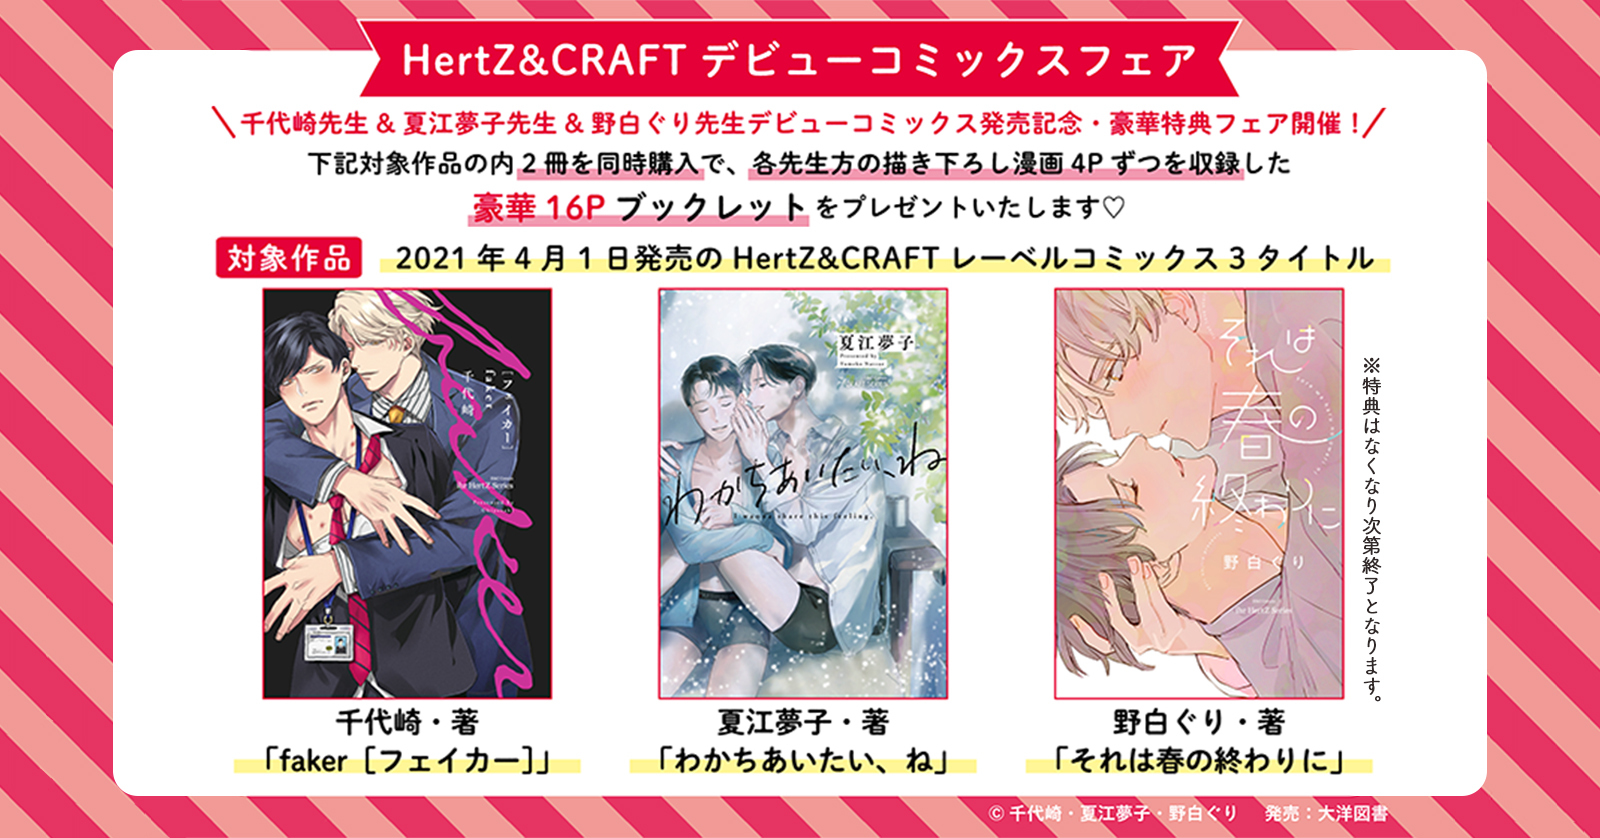 HertZ&CRAFTデビューコミックスフェア